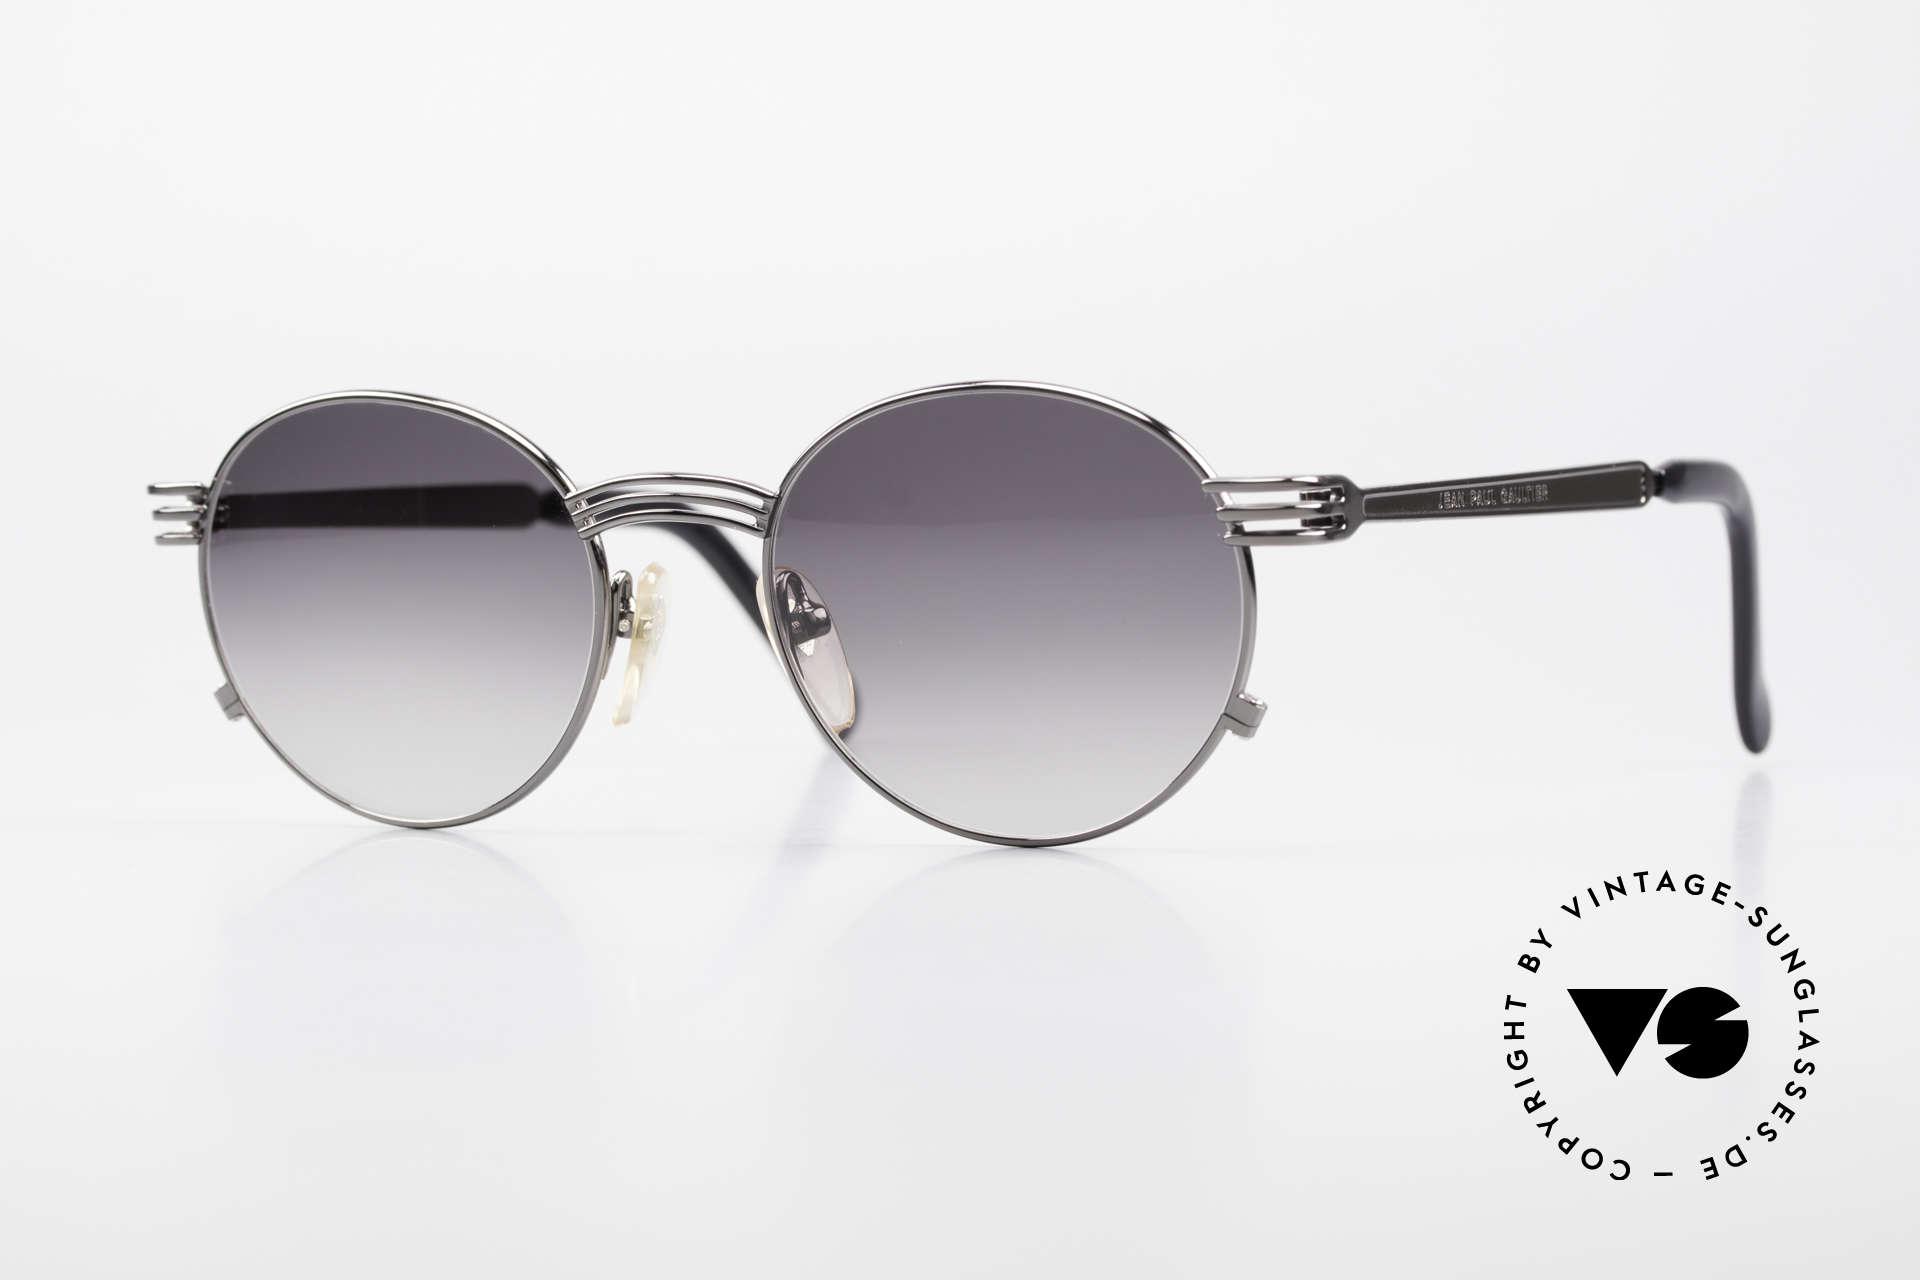 Jean Paul Gaultier 55-3174 Designer Vintage 90's Glasses, valuable & creative Jean Paul Gaultier designer glasses, Made for Men and Women